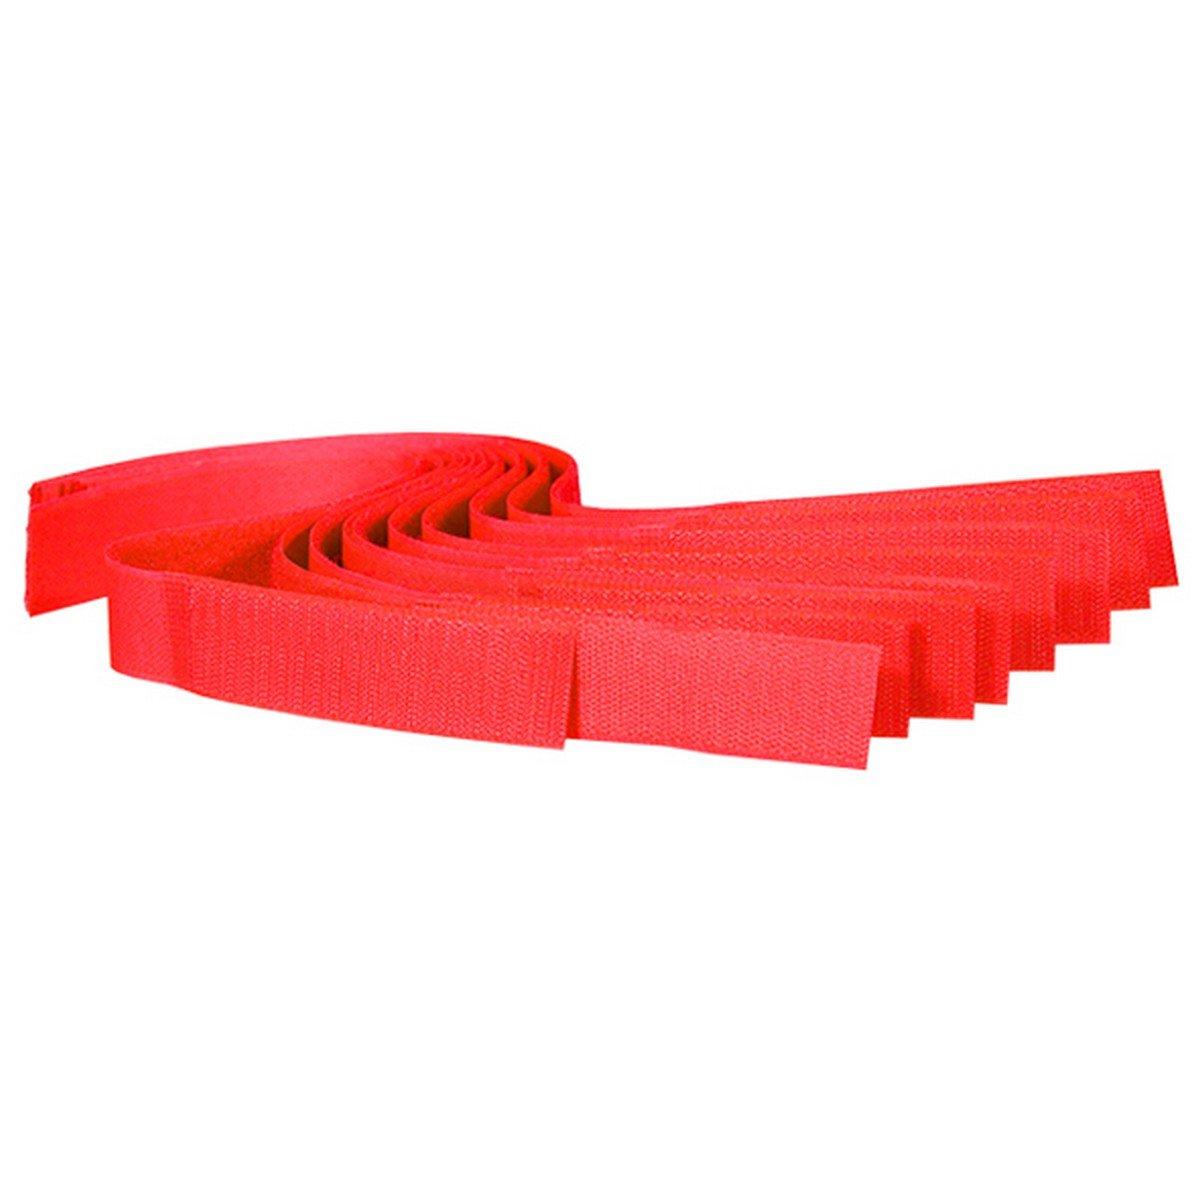 Afbeelding van a.s Koeherkenningsbandjes Velcro Rood